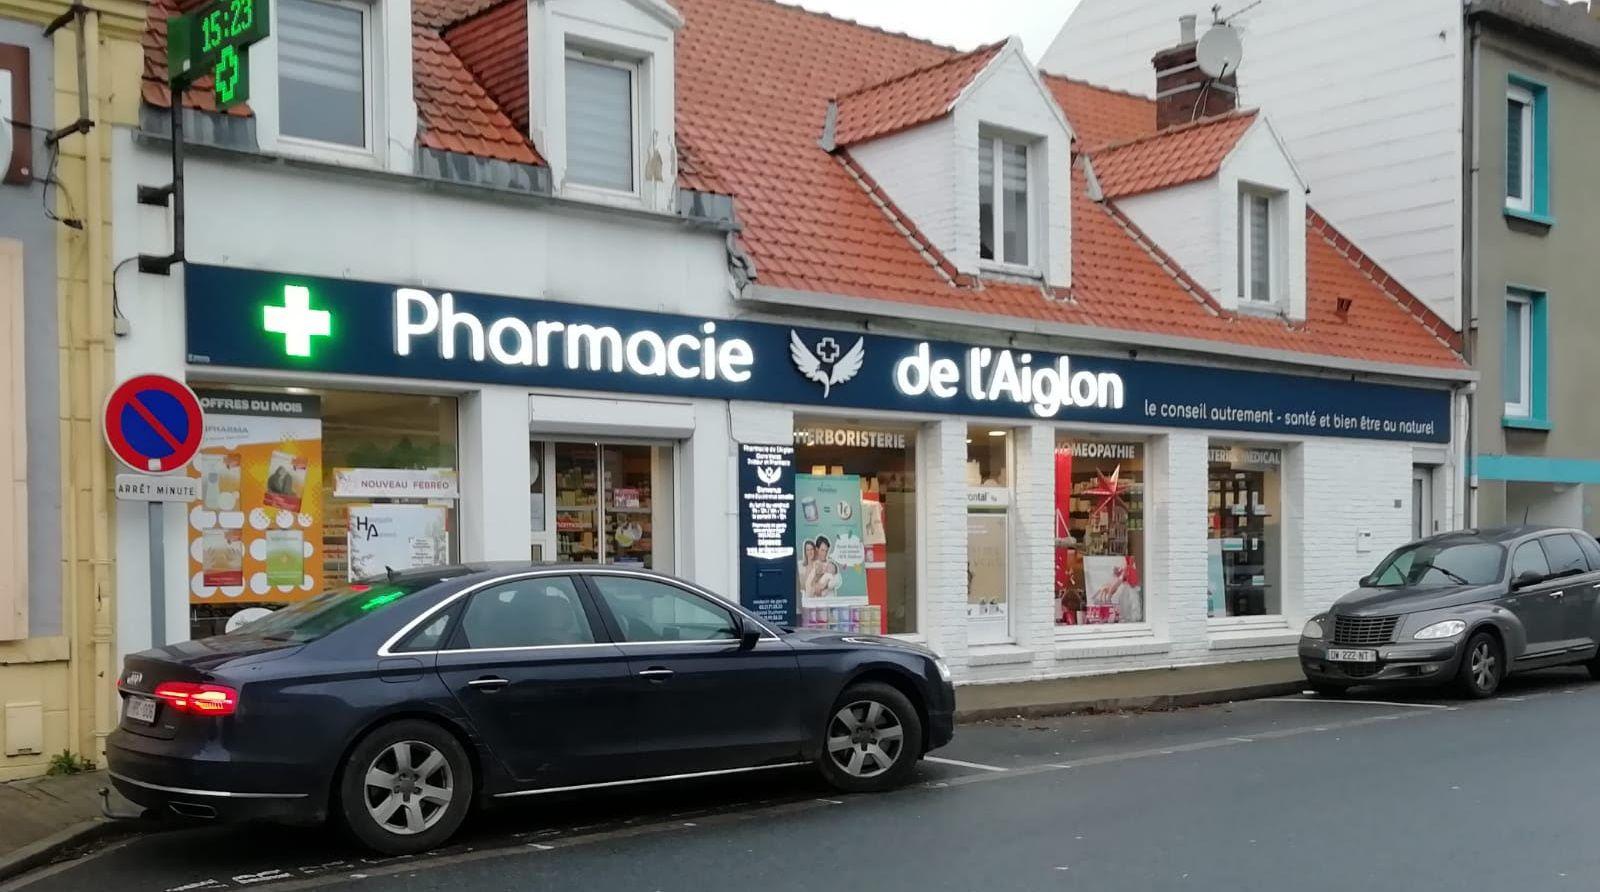 pharmacie de l'aiglan - norpharma